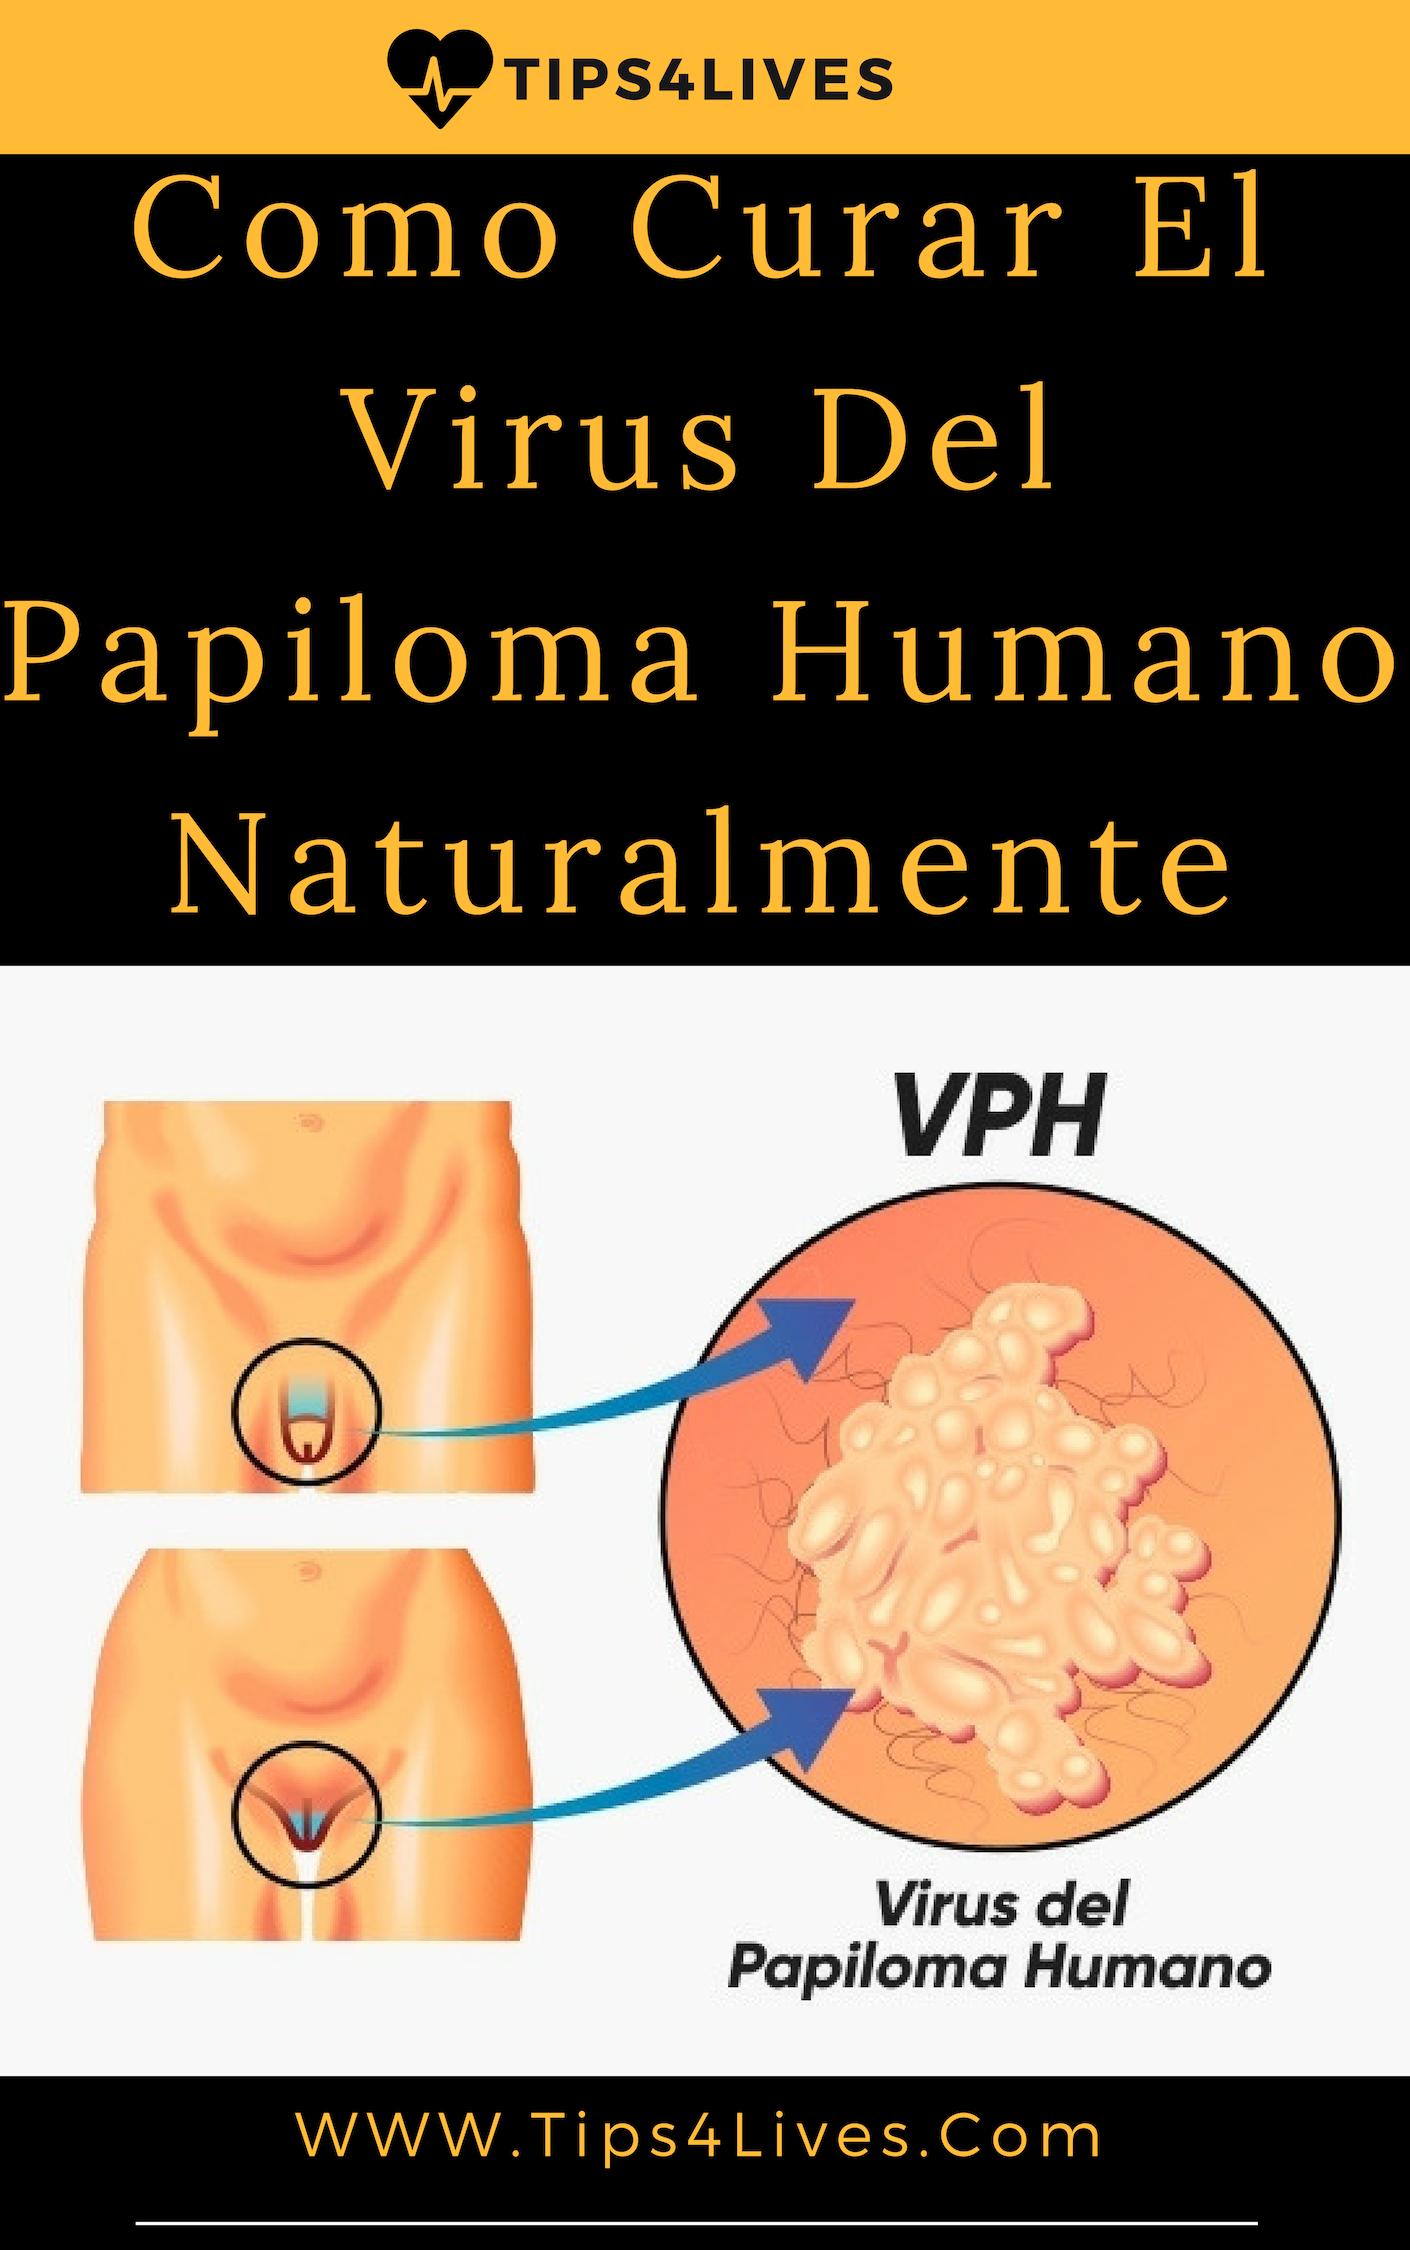 vph cancer cuello uterino sintomas lesion hpv gorge